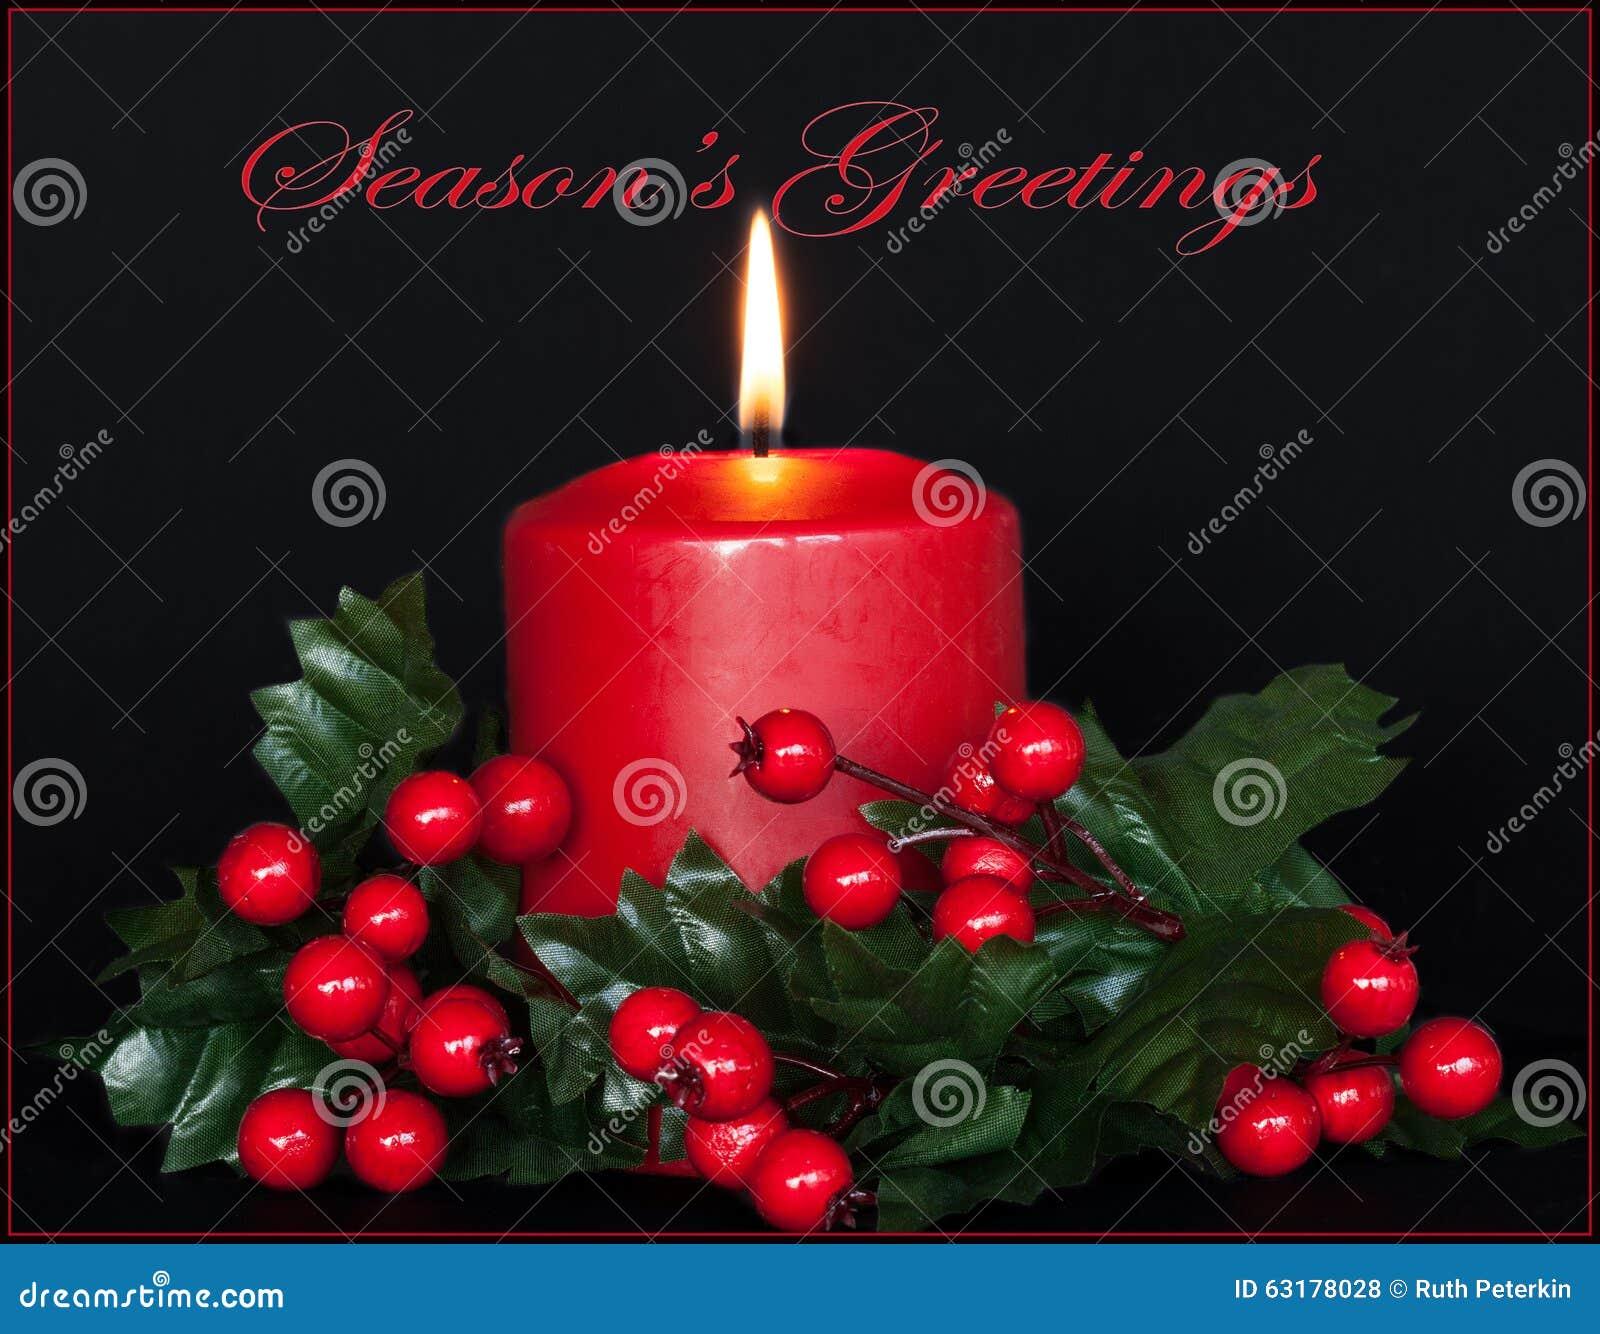 Seasons greetings card stock photo image of decoration 63178028 download seasons greetings card stock photo image of decoration 63178028 m4hsunfo